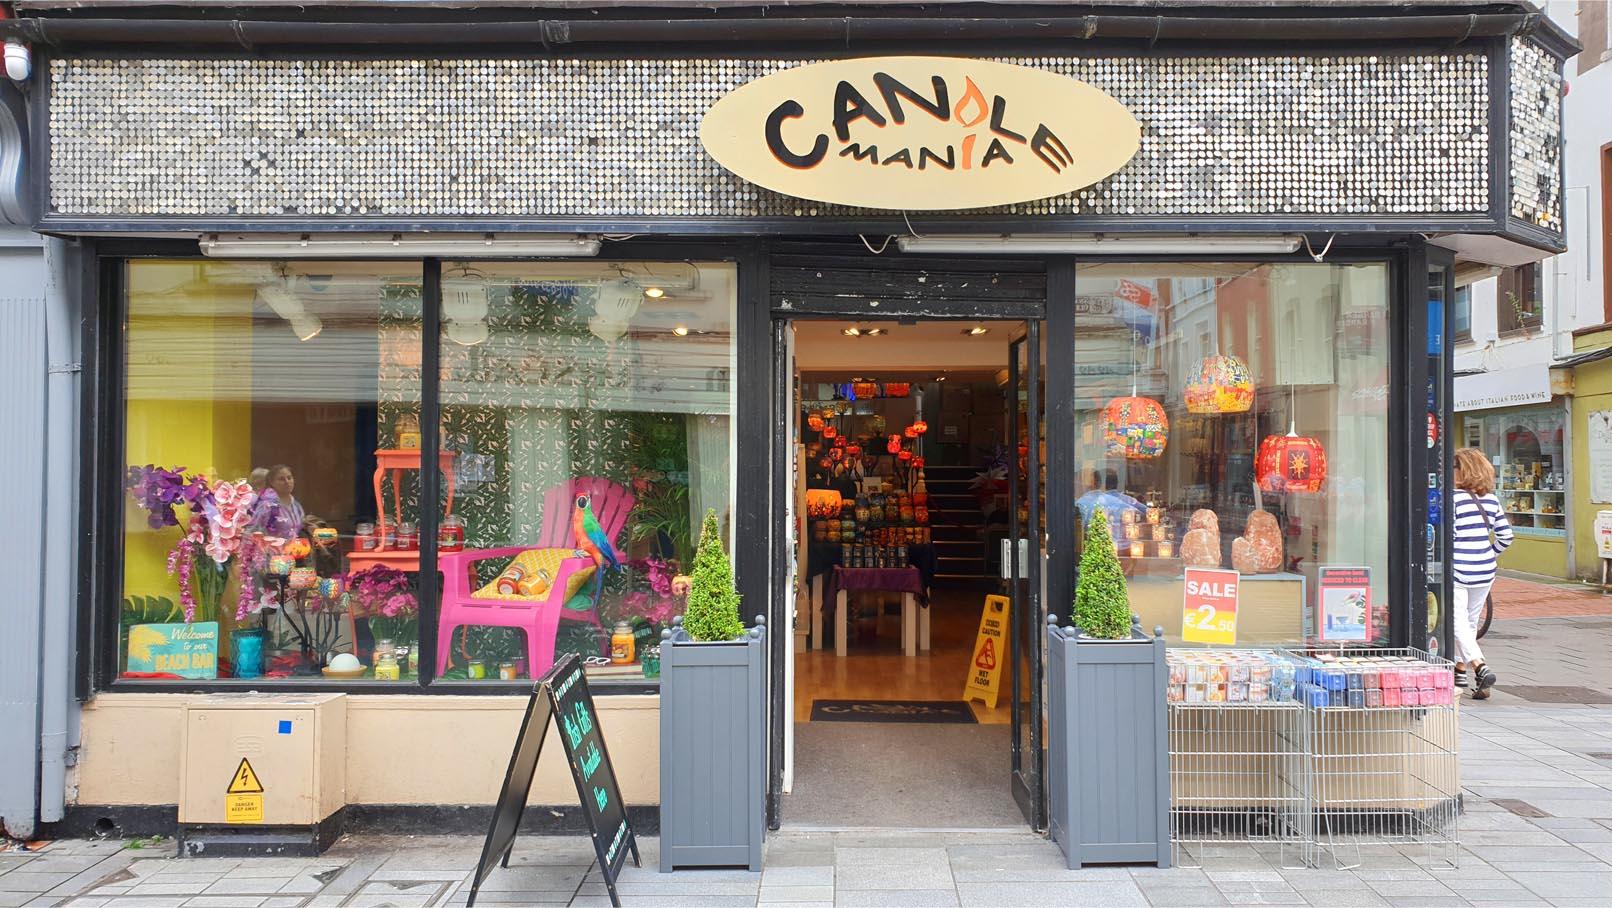 Candlemania Yankee Candle Specialist 2019 Oliver Plunkett Street Cork City Ireland